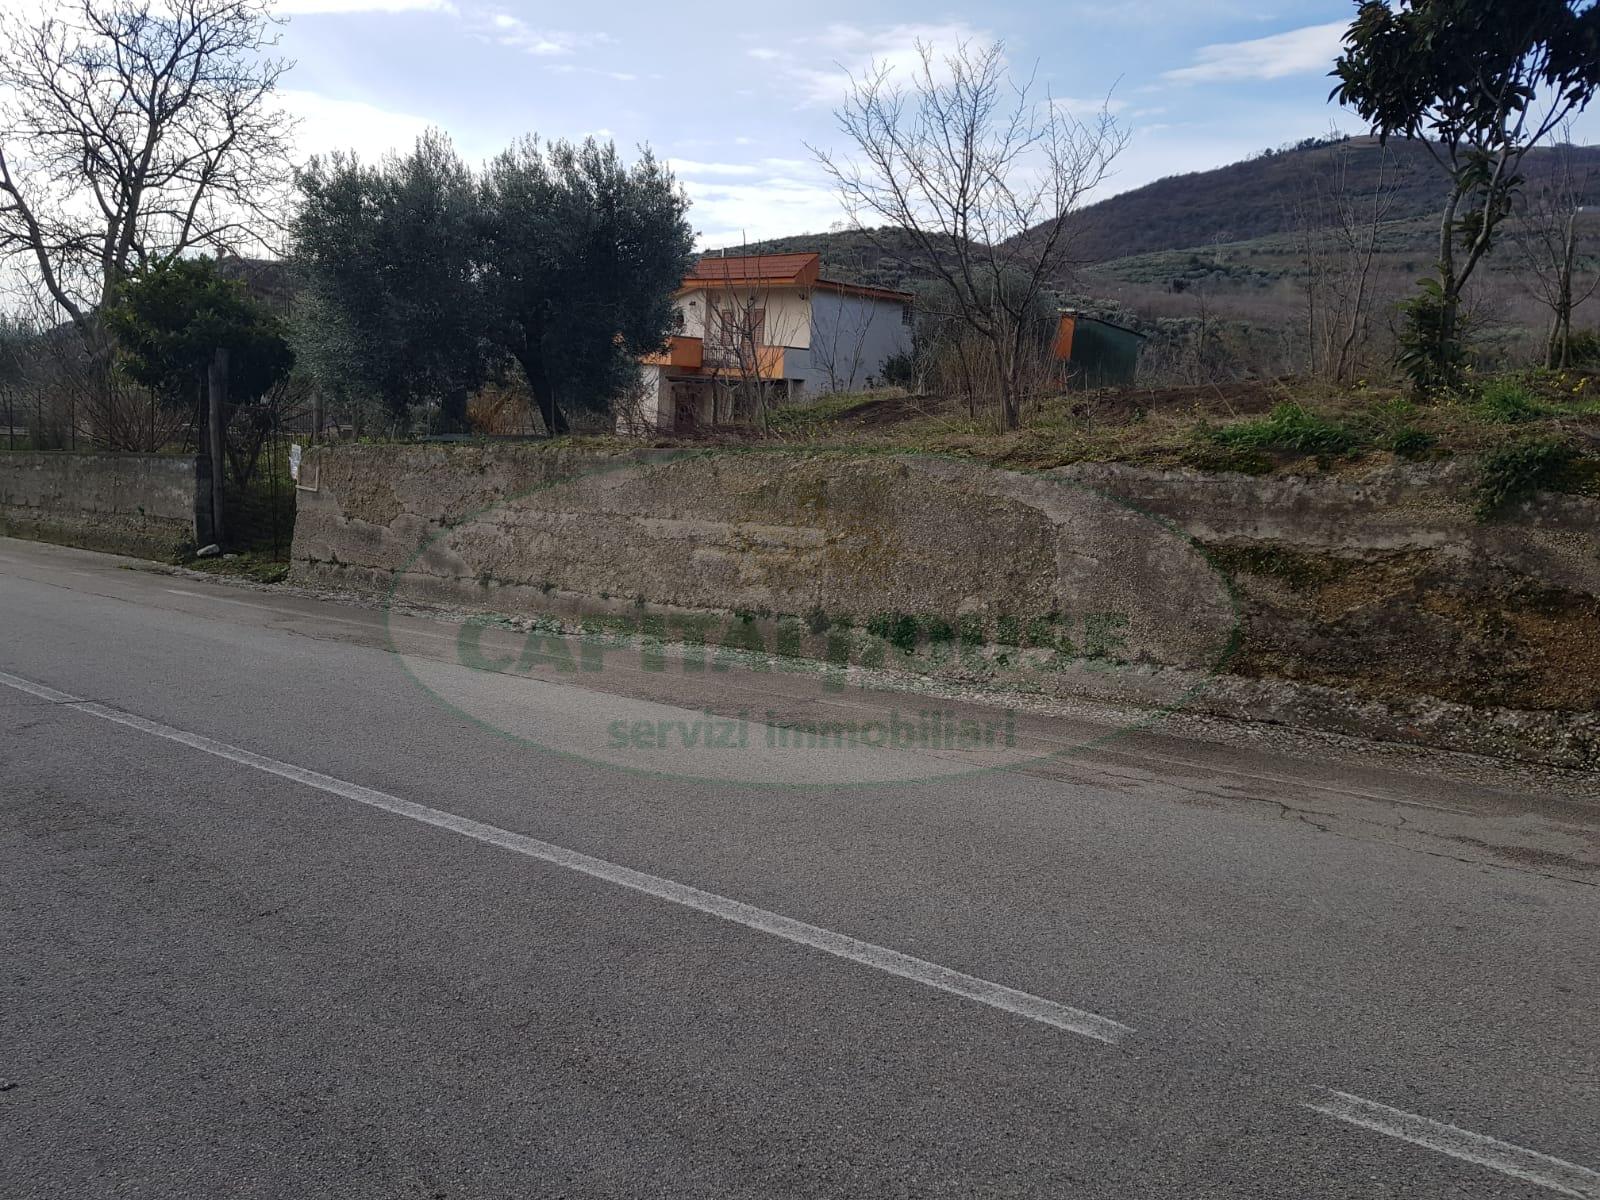 Terreno a Roccarainola - 01